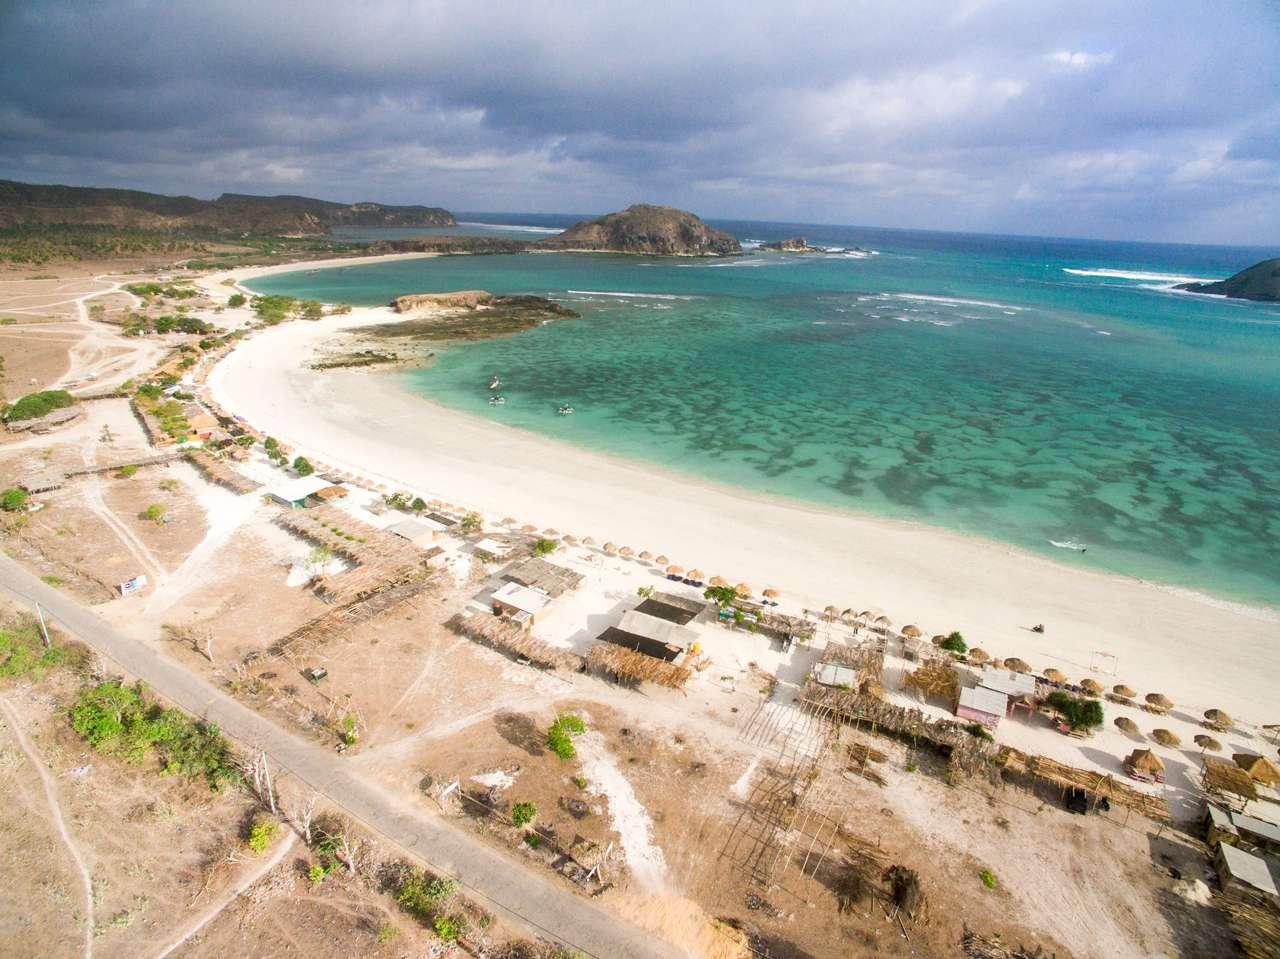 mandalika tourism special economic zone